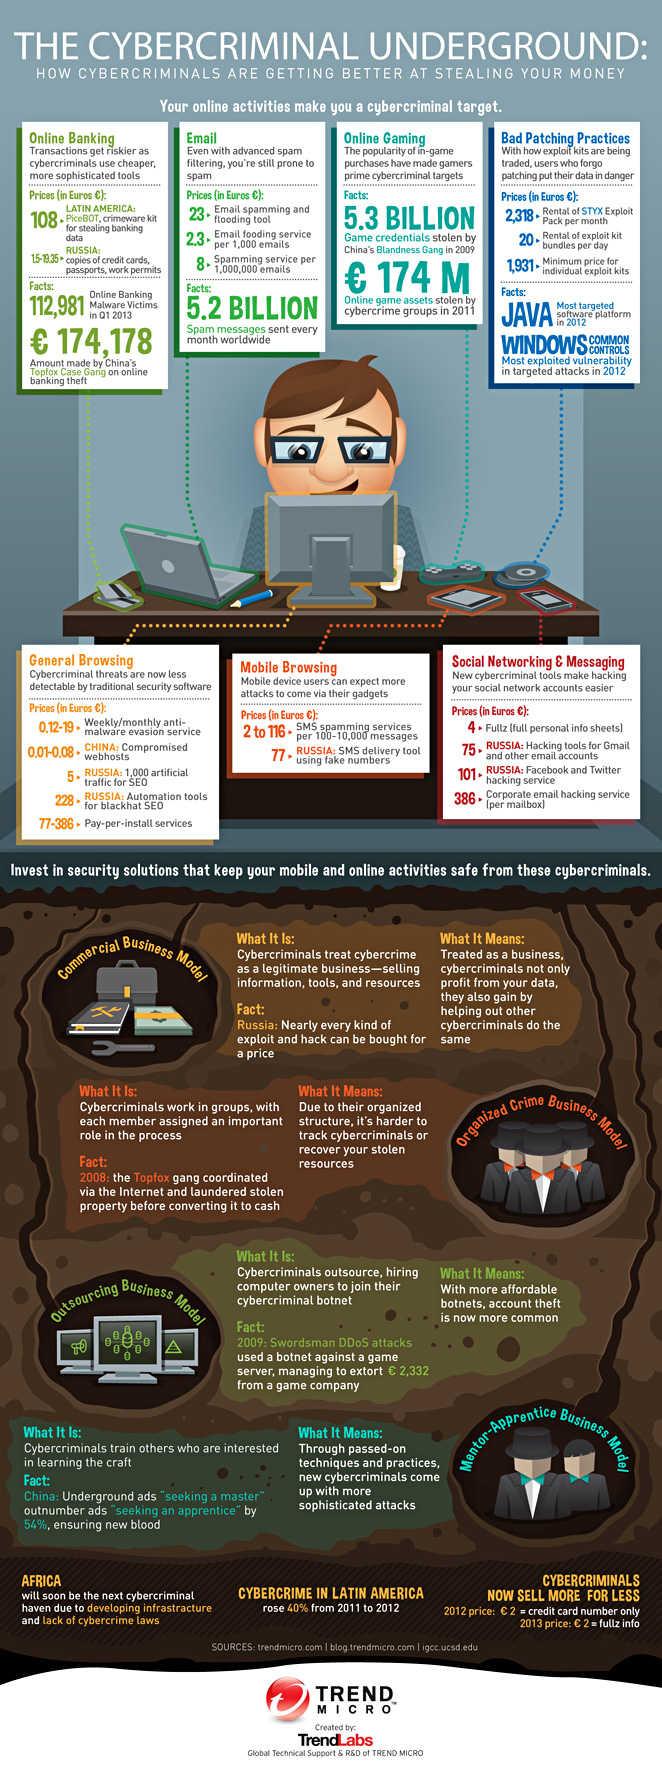 The Cybercriminal Underground